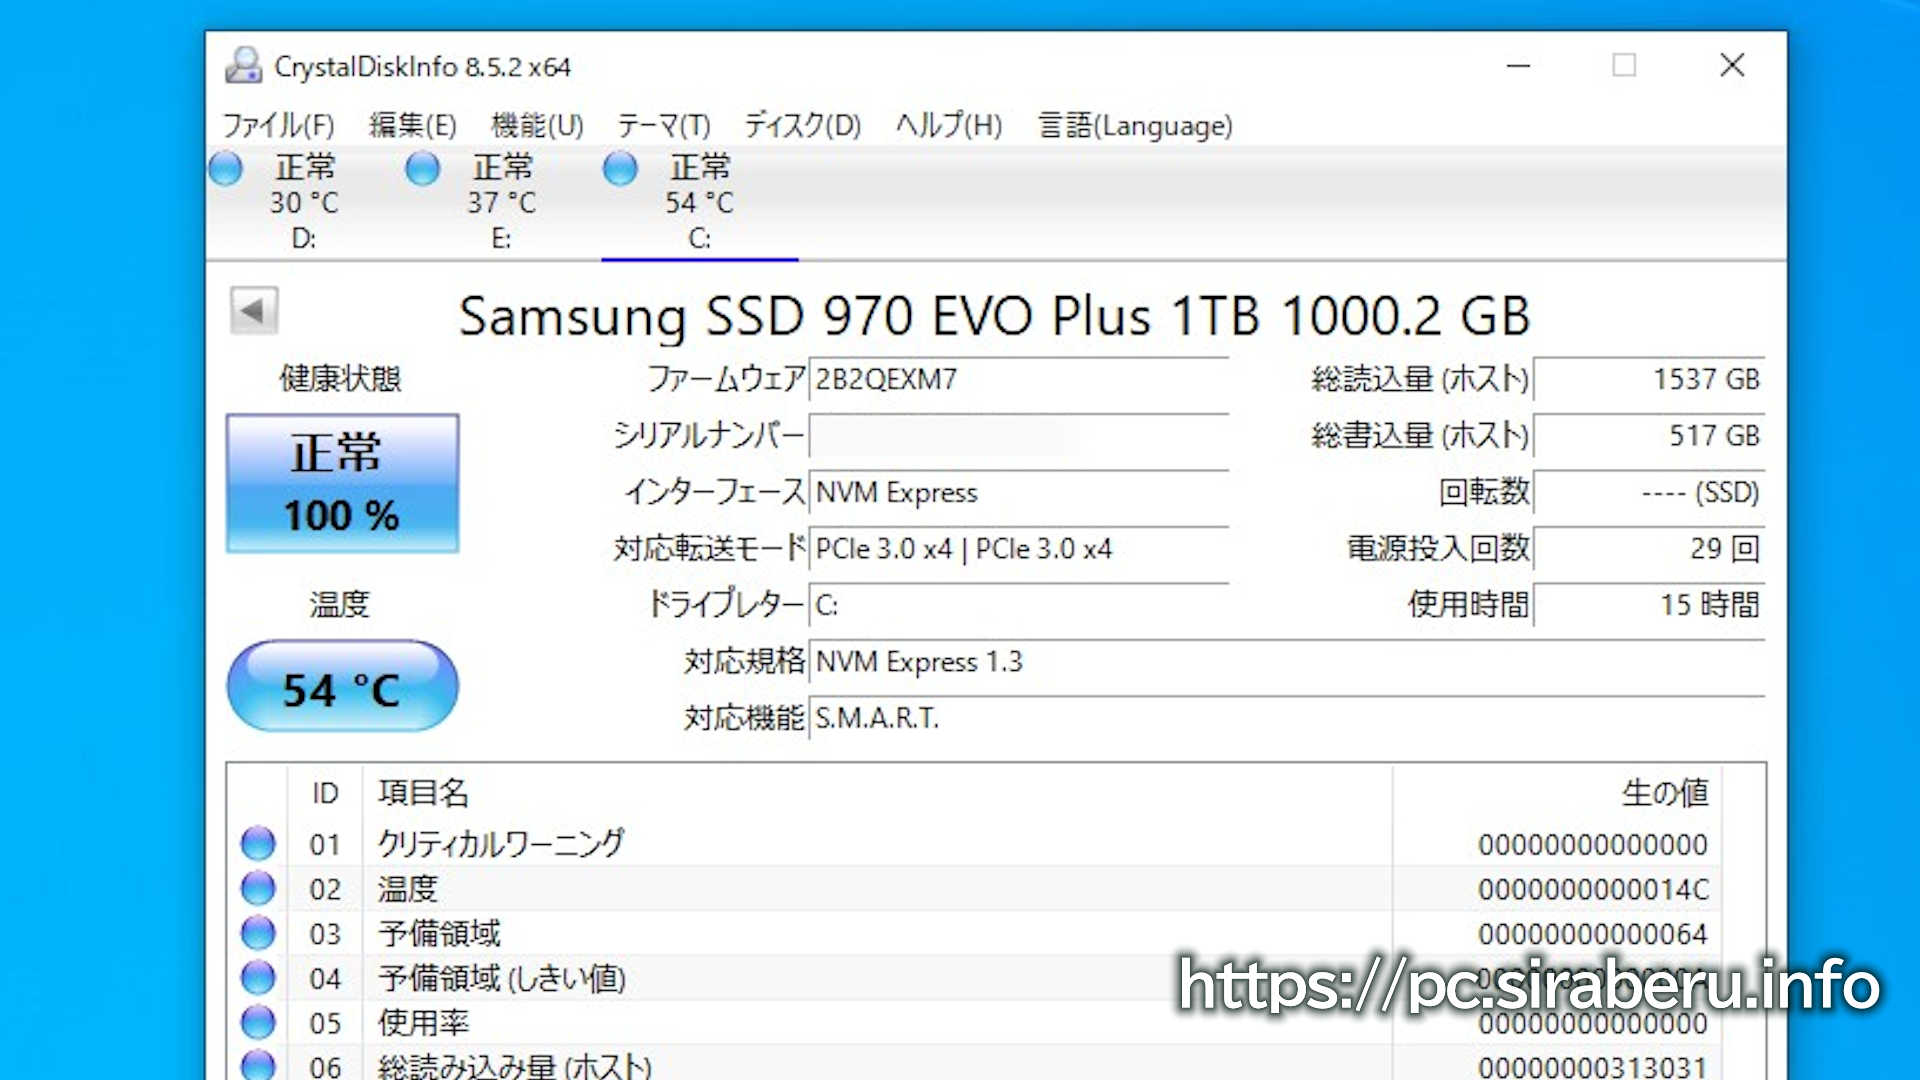 「Samsung 970 EVO Plus 1TB」のCrystalDiskInfoの情報